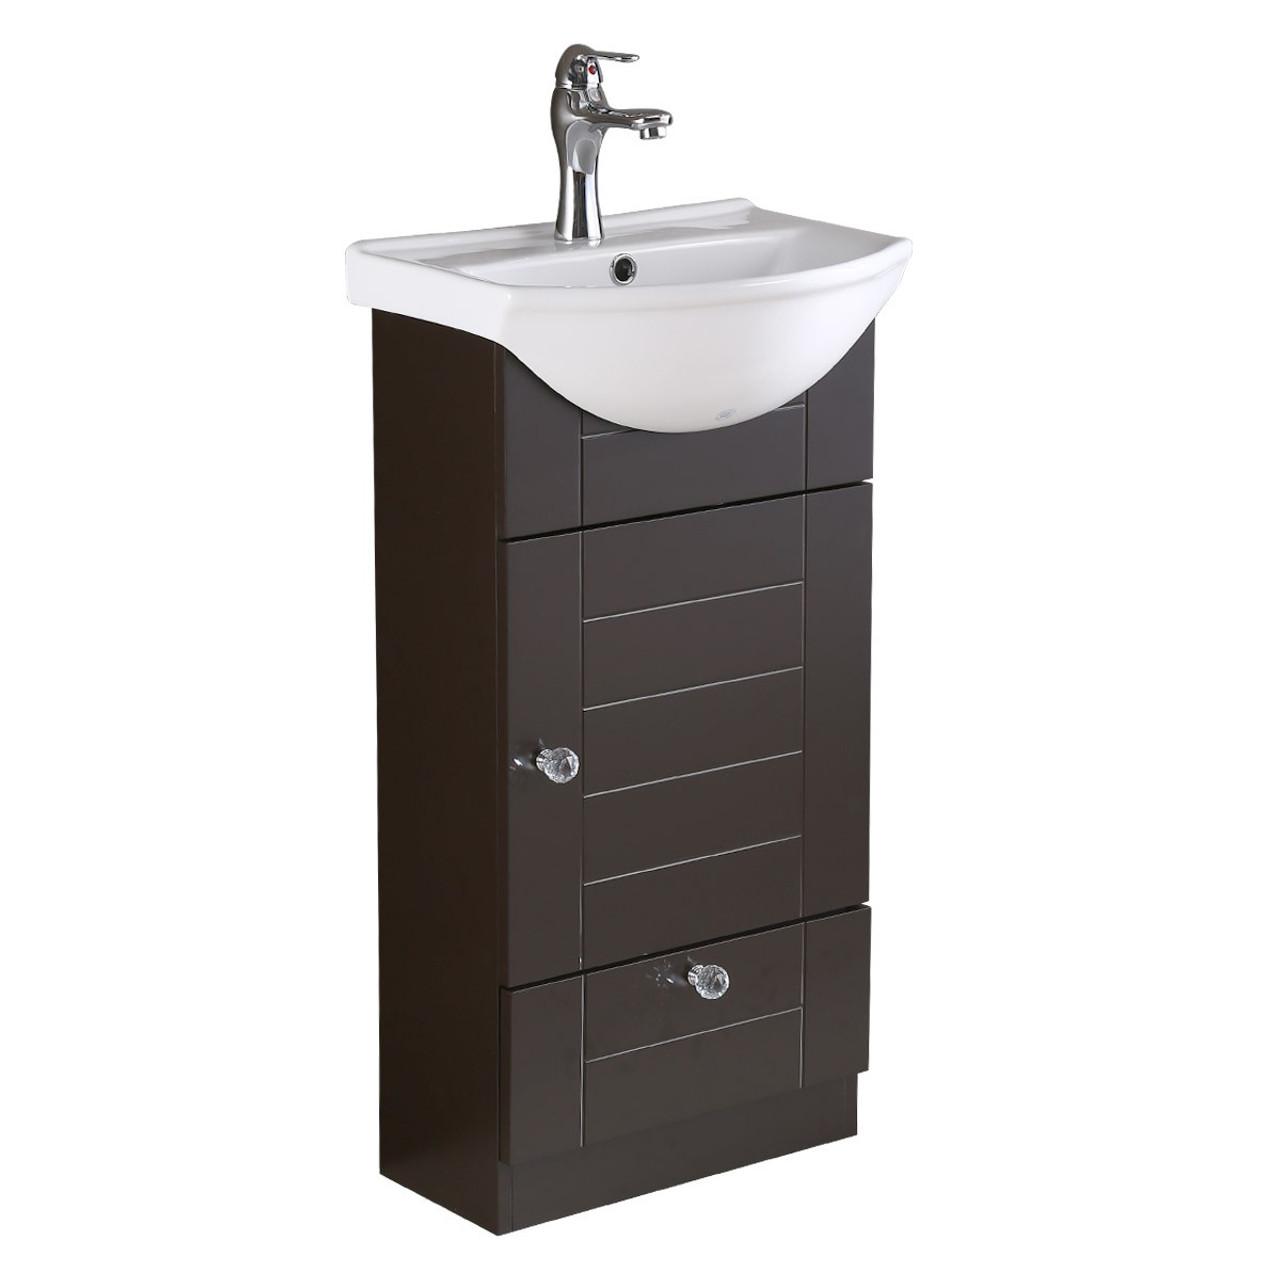 Lorixon Lv 1001e Espresso Bathroom Vanity Ceramic Sink White